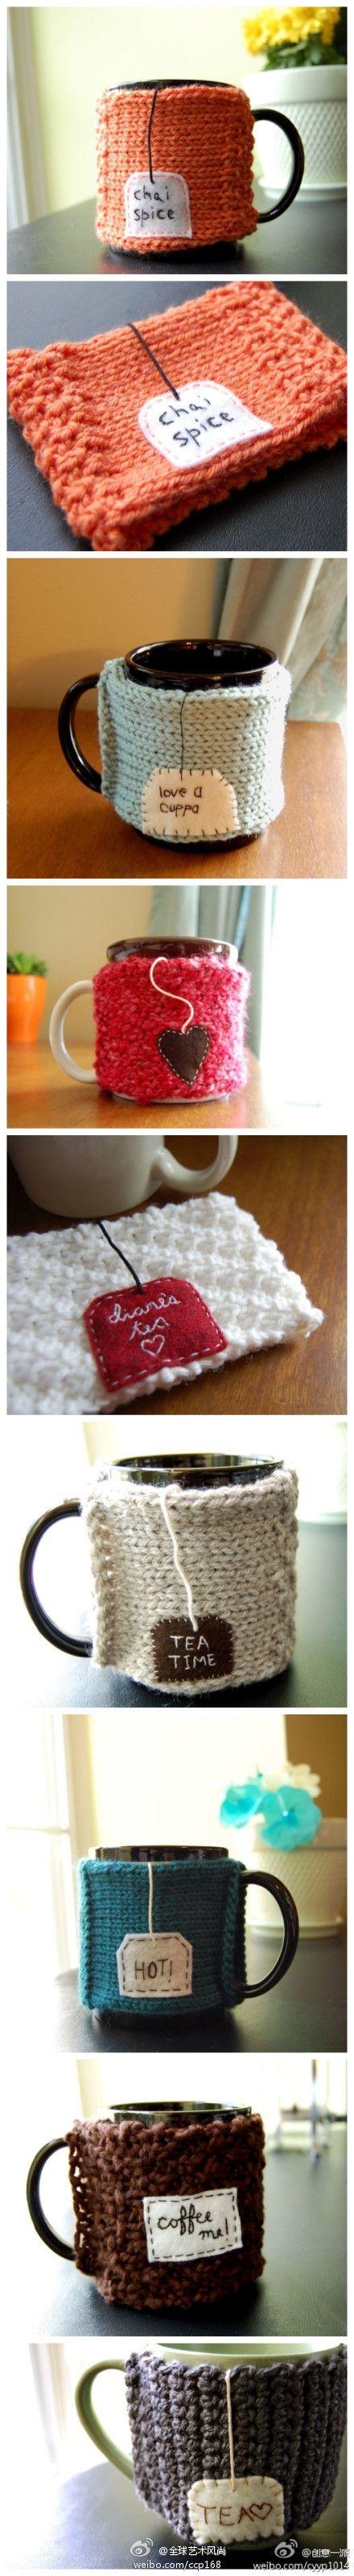 Super cute mug cozies